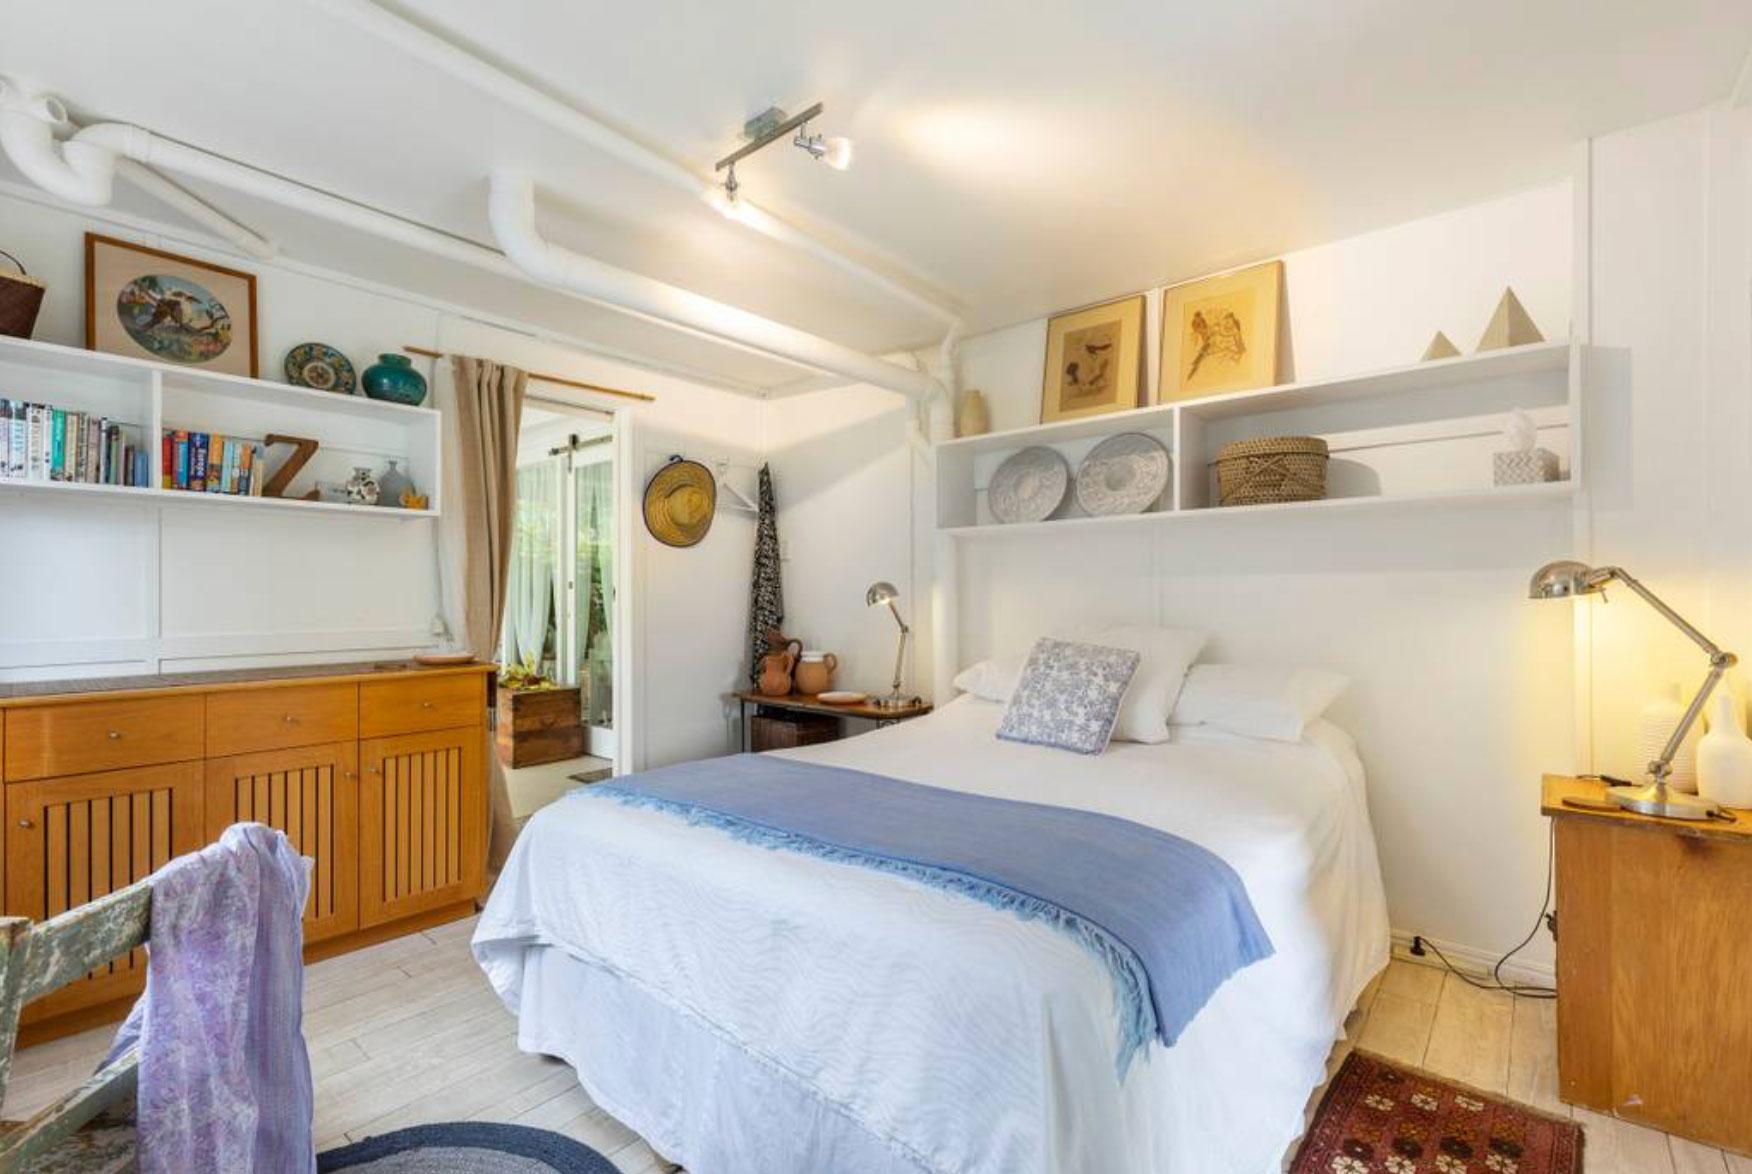 airbnb-apartment4.jpg